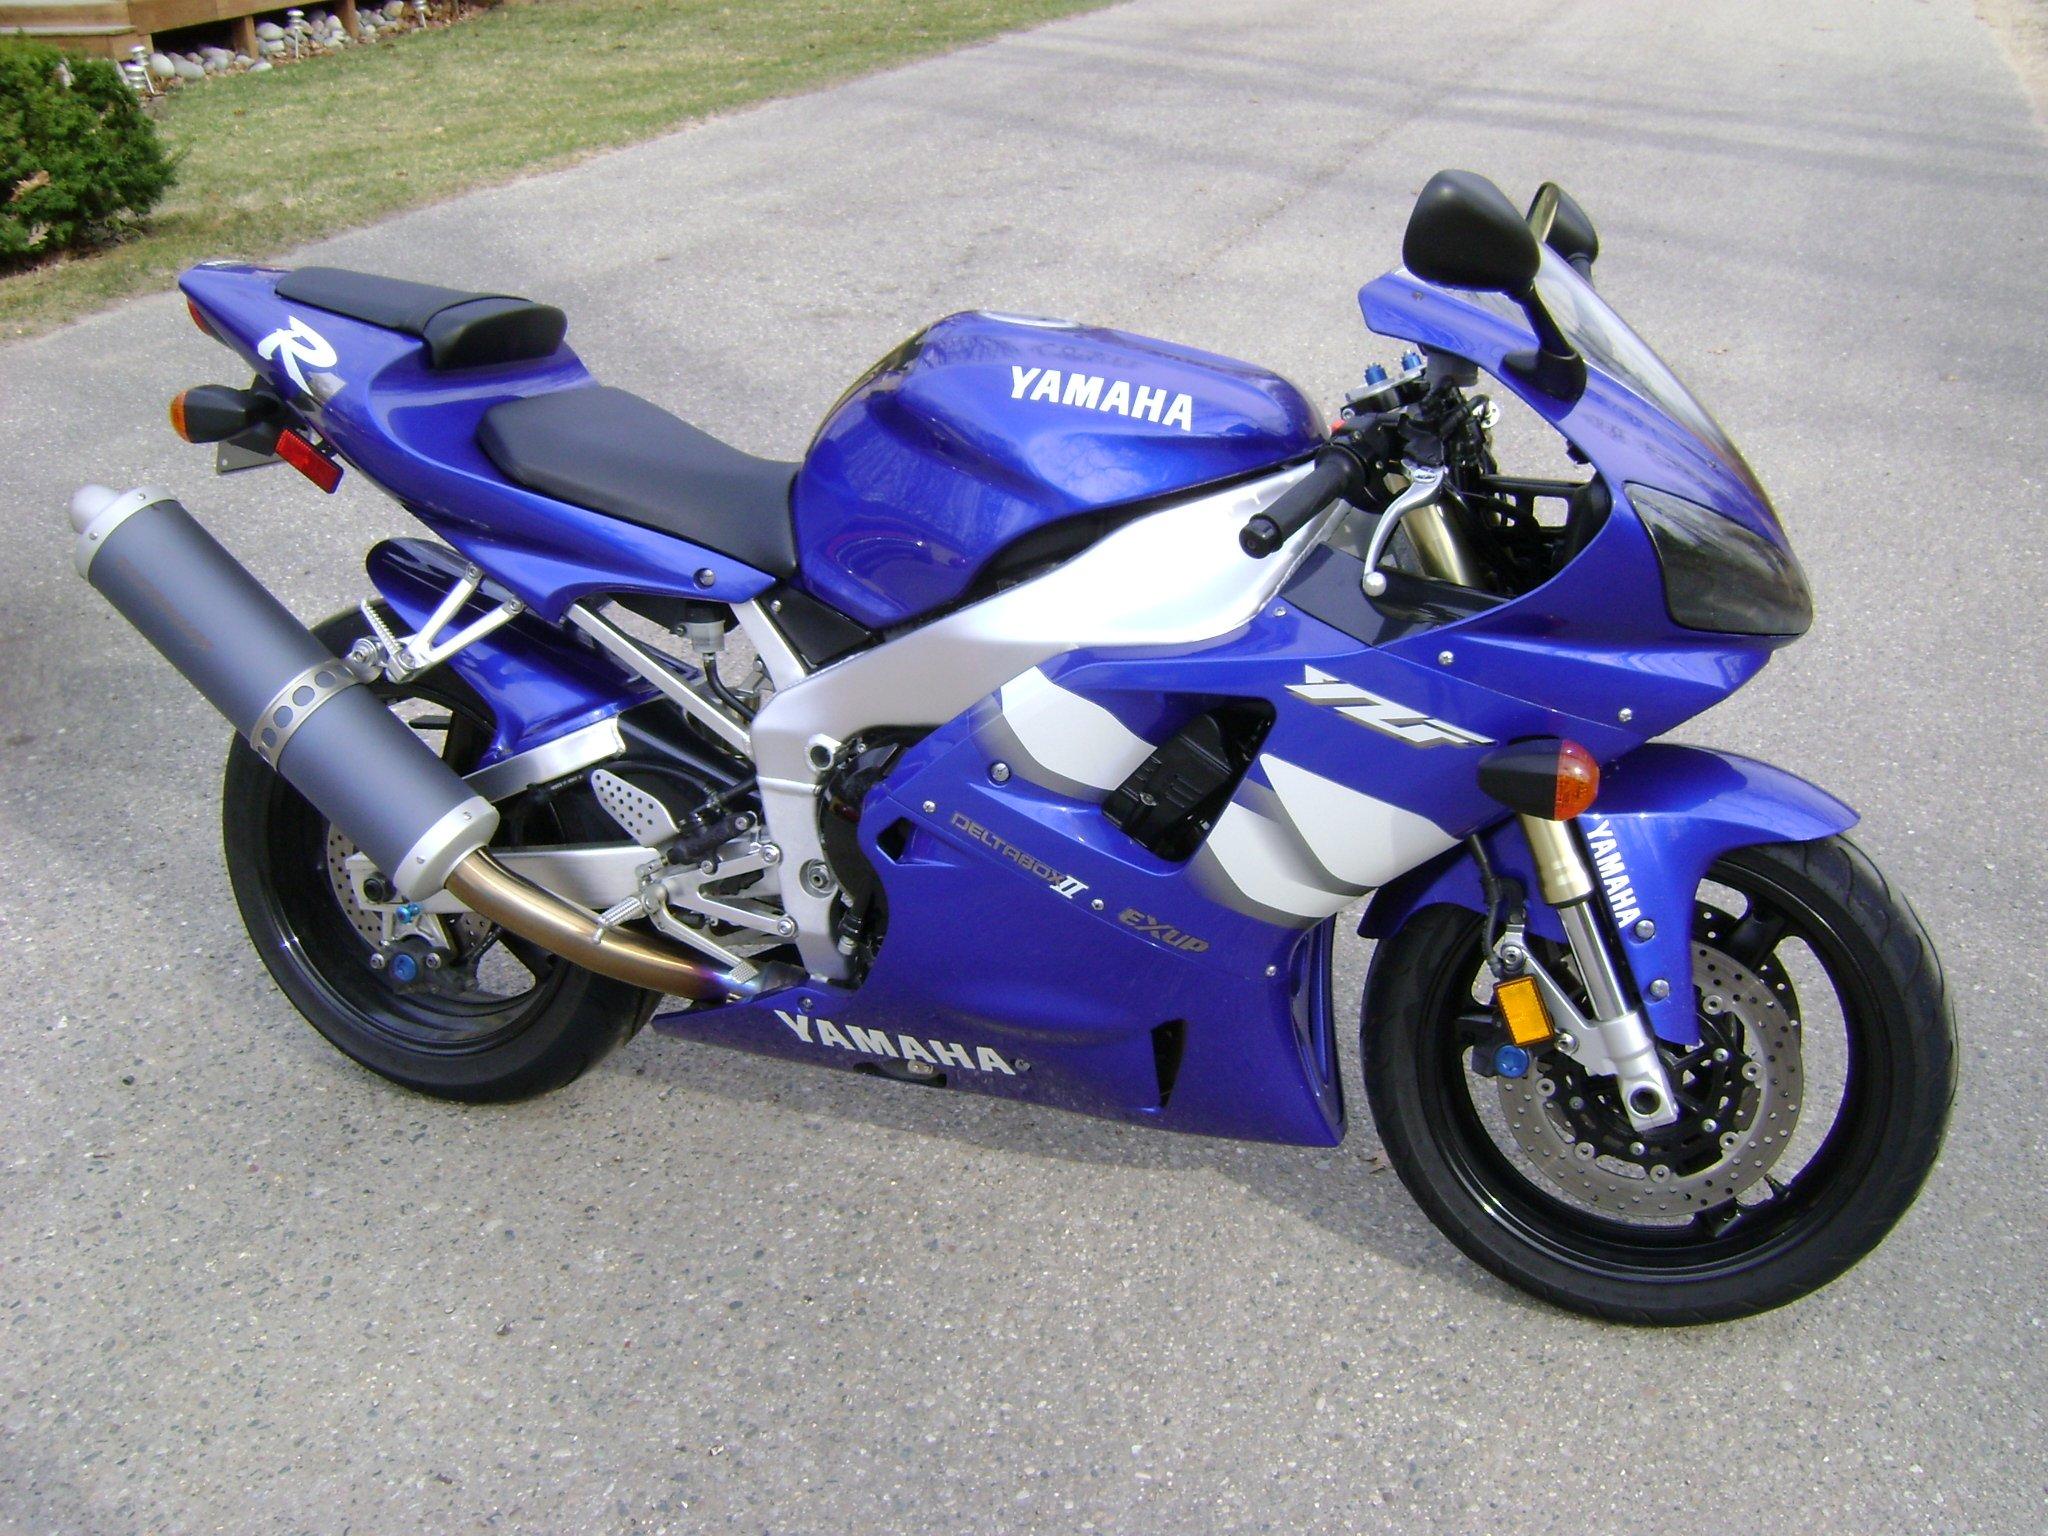 Selling my 2000 Yamaha R1 Sport Bike on eBay-1_r1_left_side.jpg